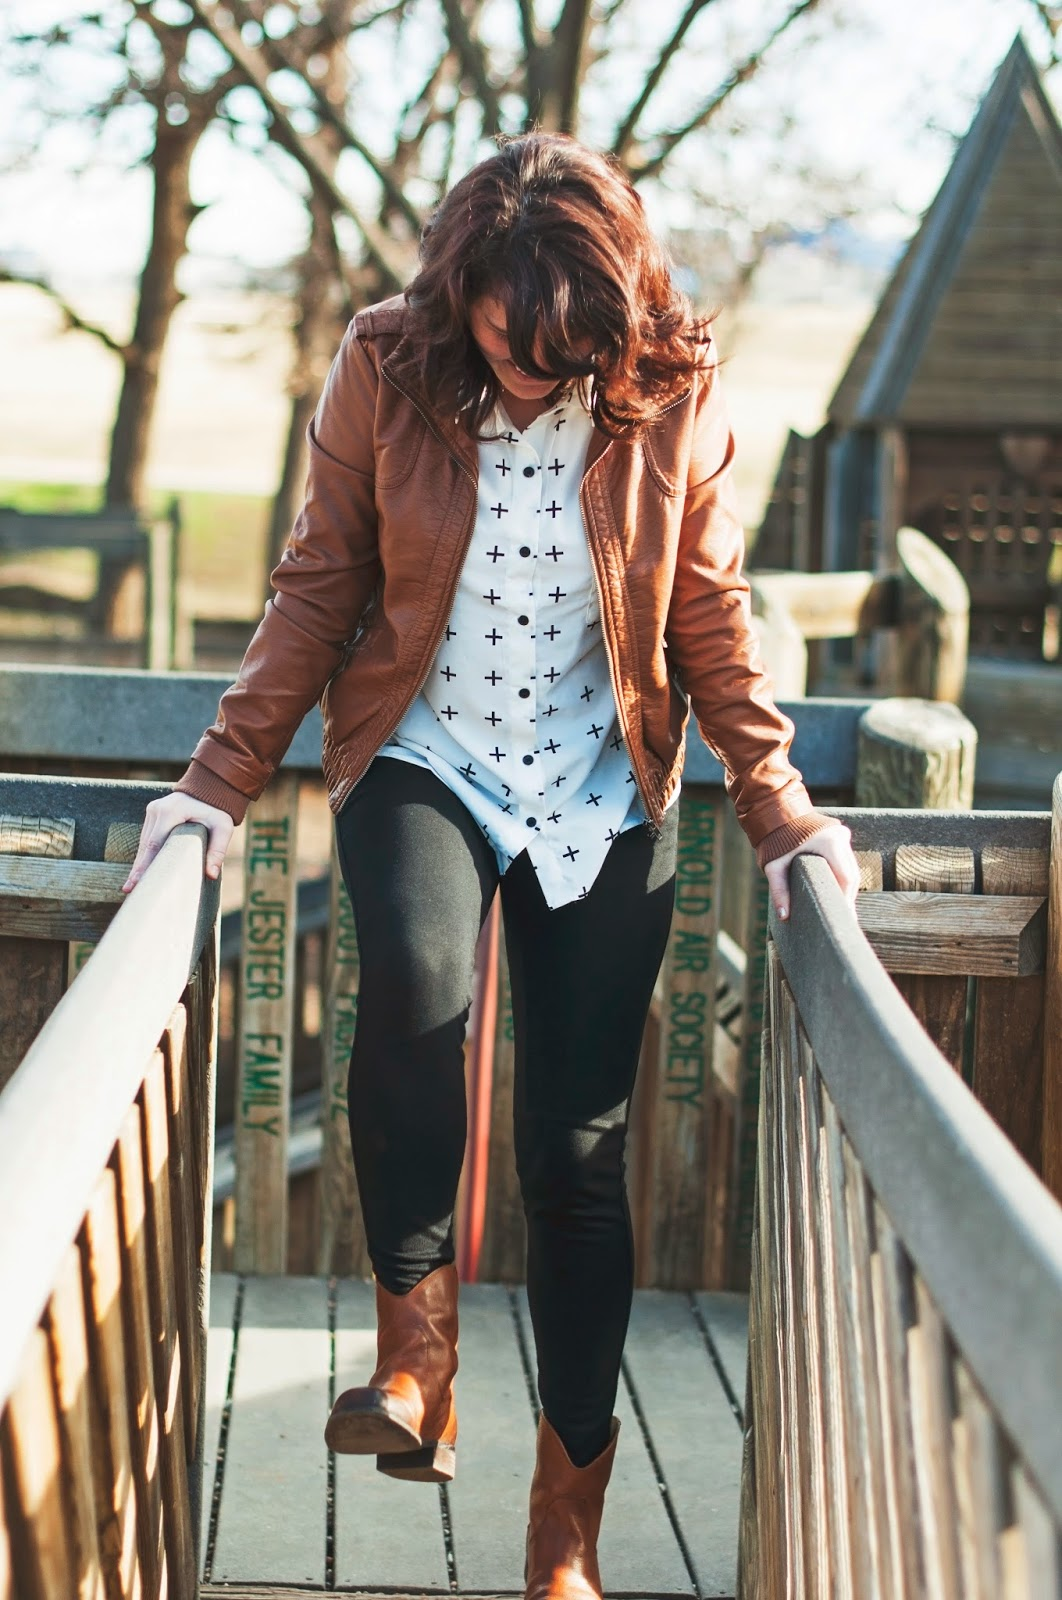 leggings, leather jacket, tunic & booties, the ultimate comfy uniform